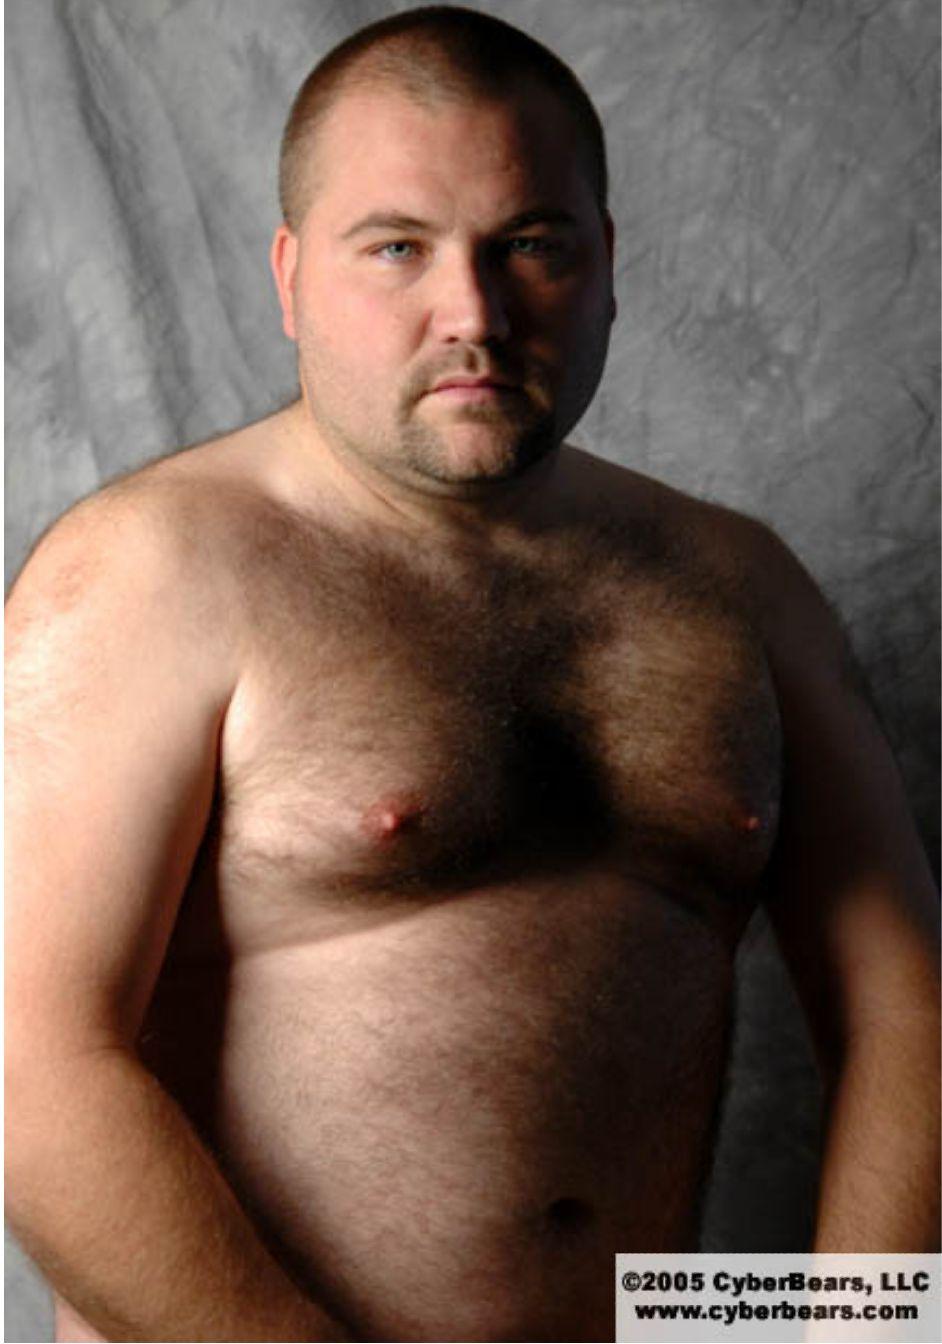 ... Web Tags: cyberbears, cyberbears.com, gay bear, sd cubby, shirtless